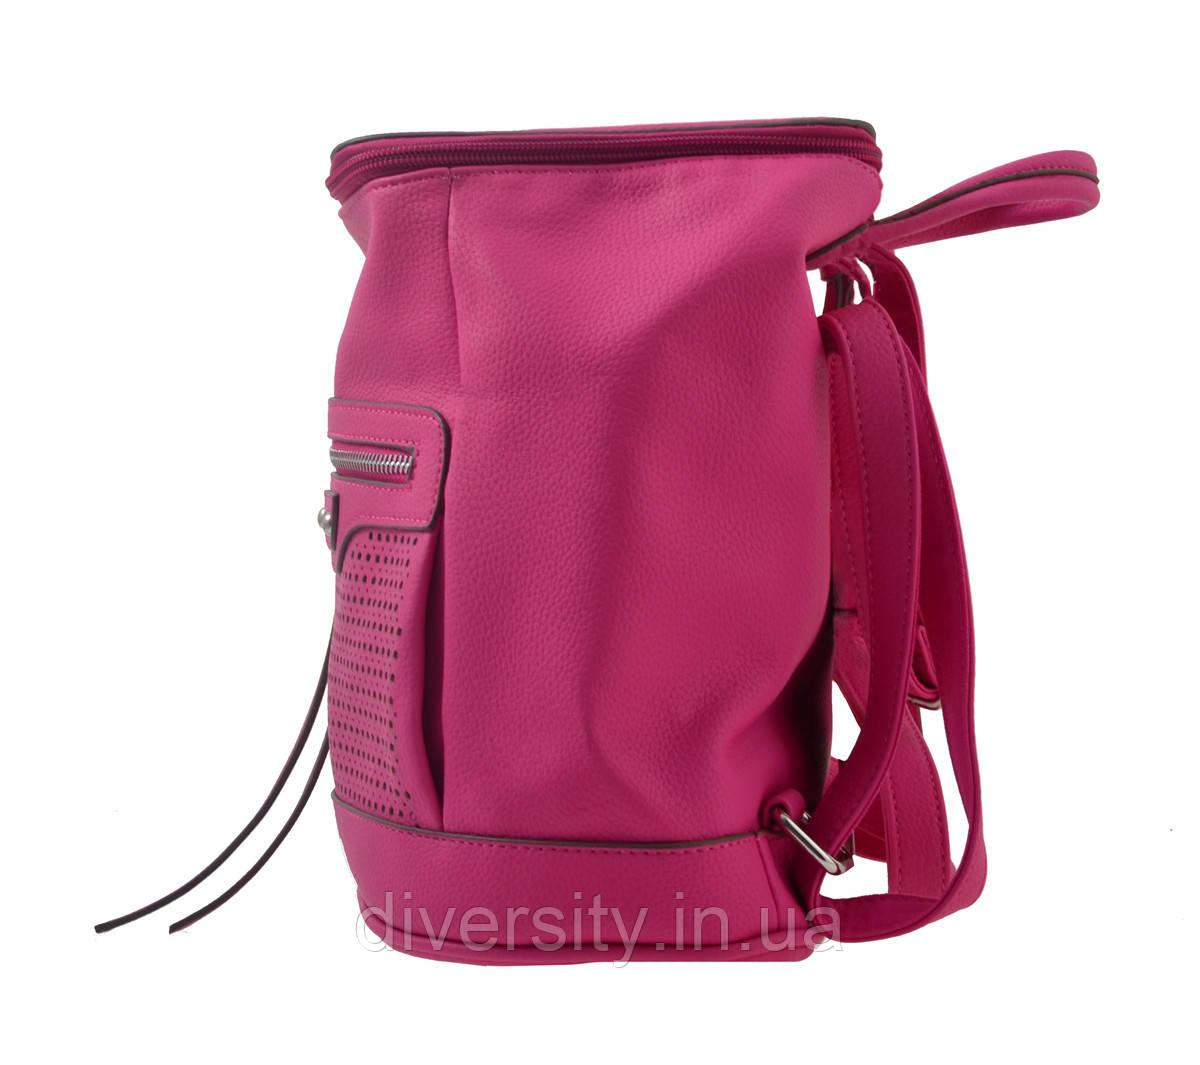 Сумка-рюкзак  YES,  розовый,  26*14*27см